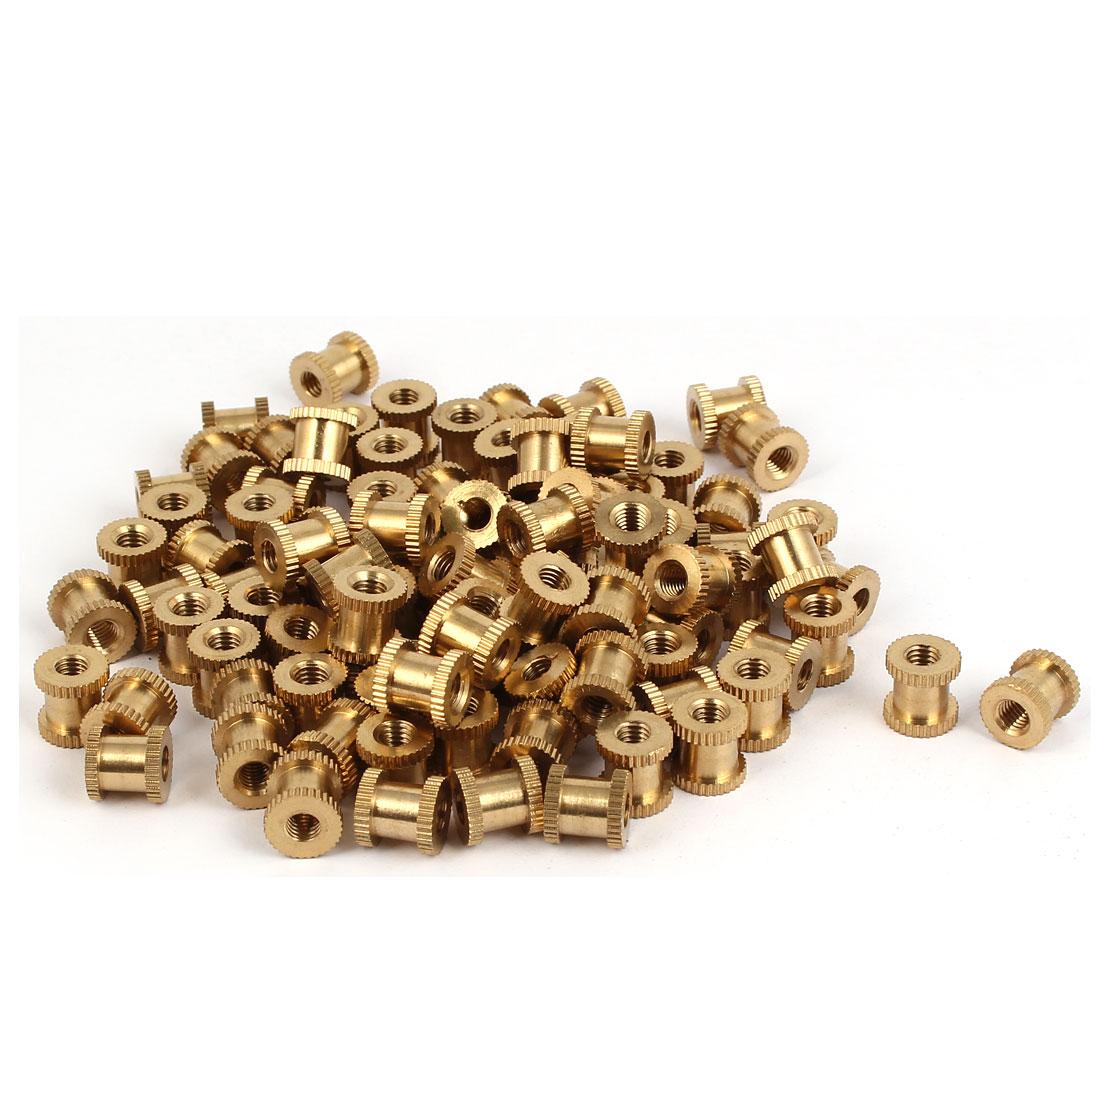 M5 x 10mm Brass Cylinder Knurled Threaded Round Insert Embedded Nuts 100PCS